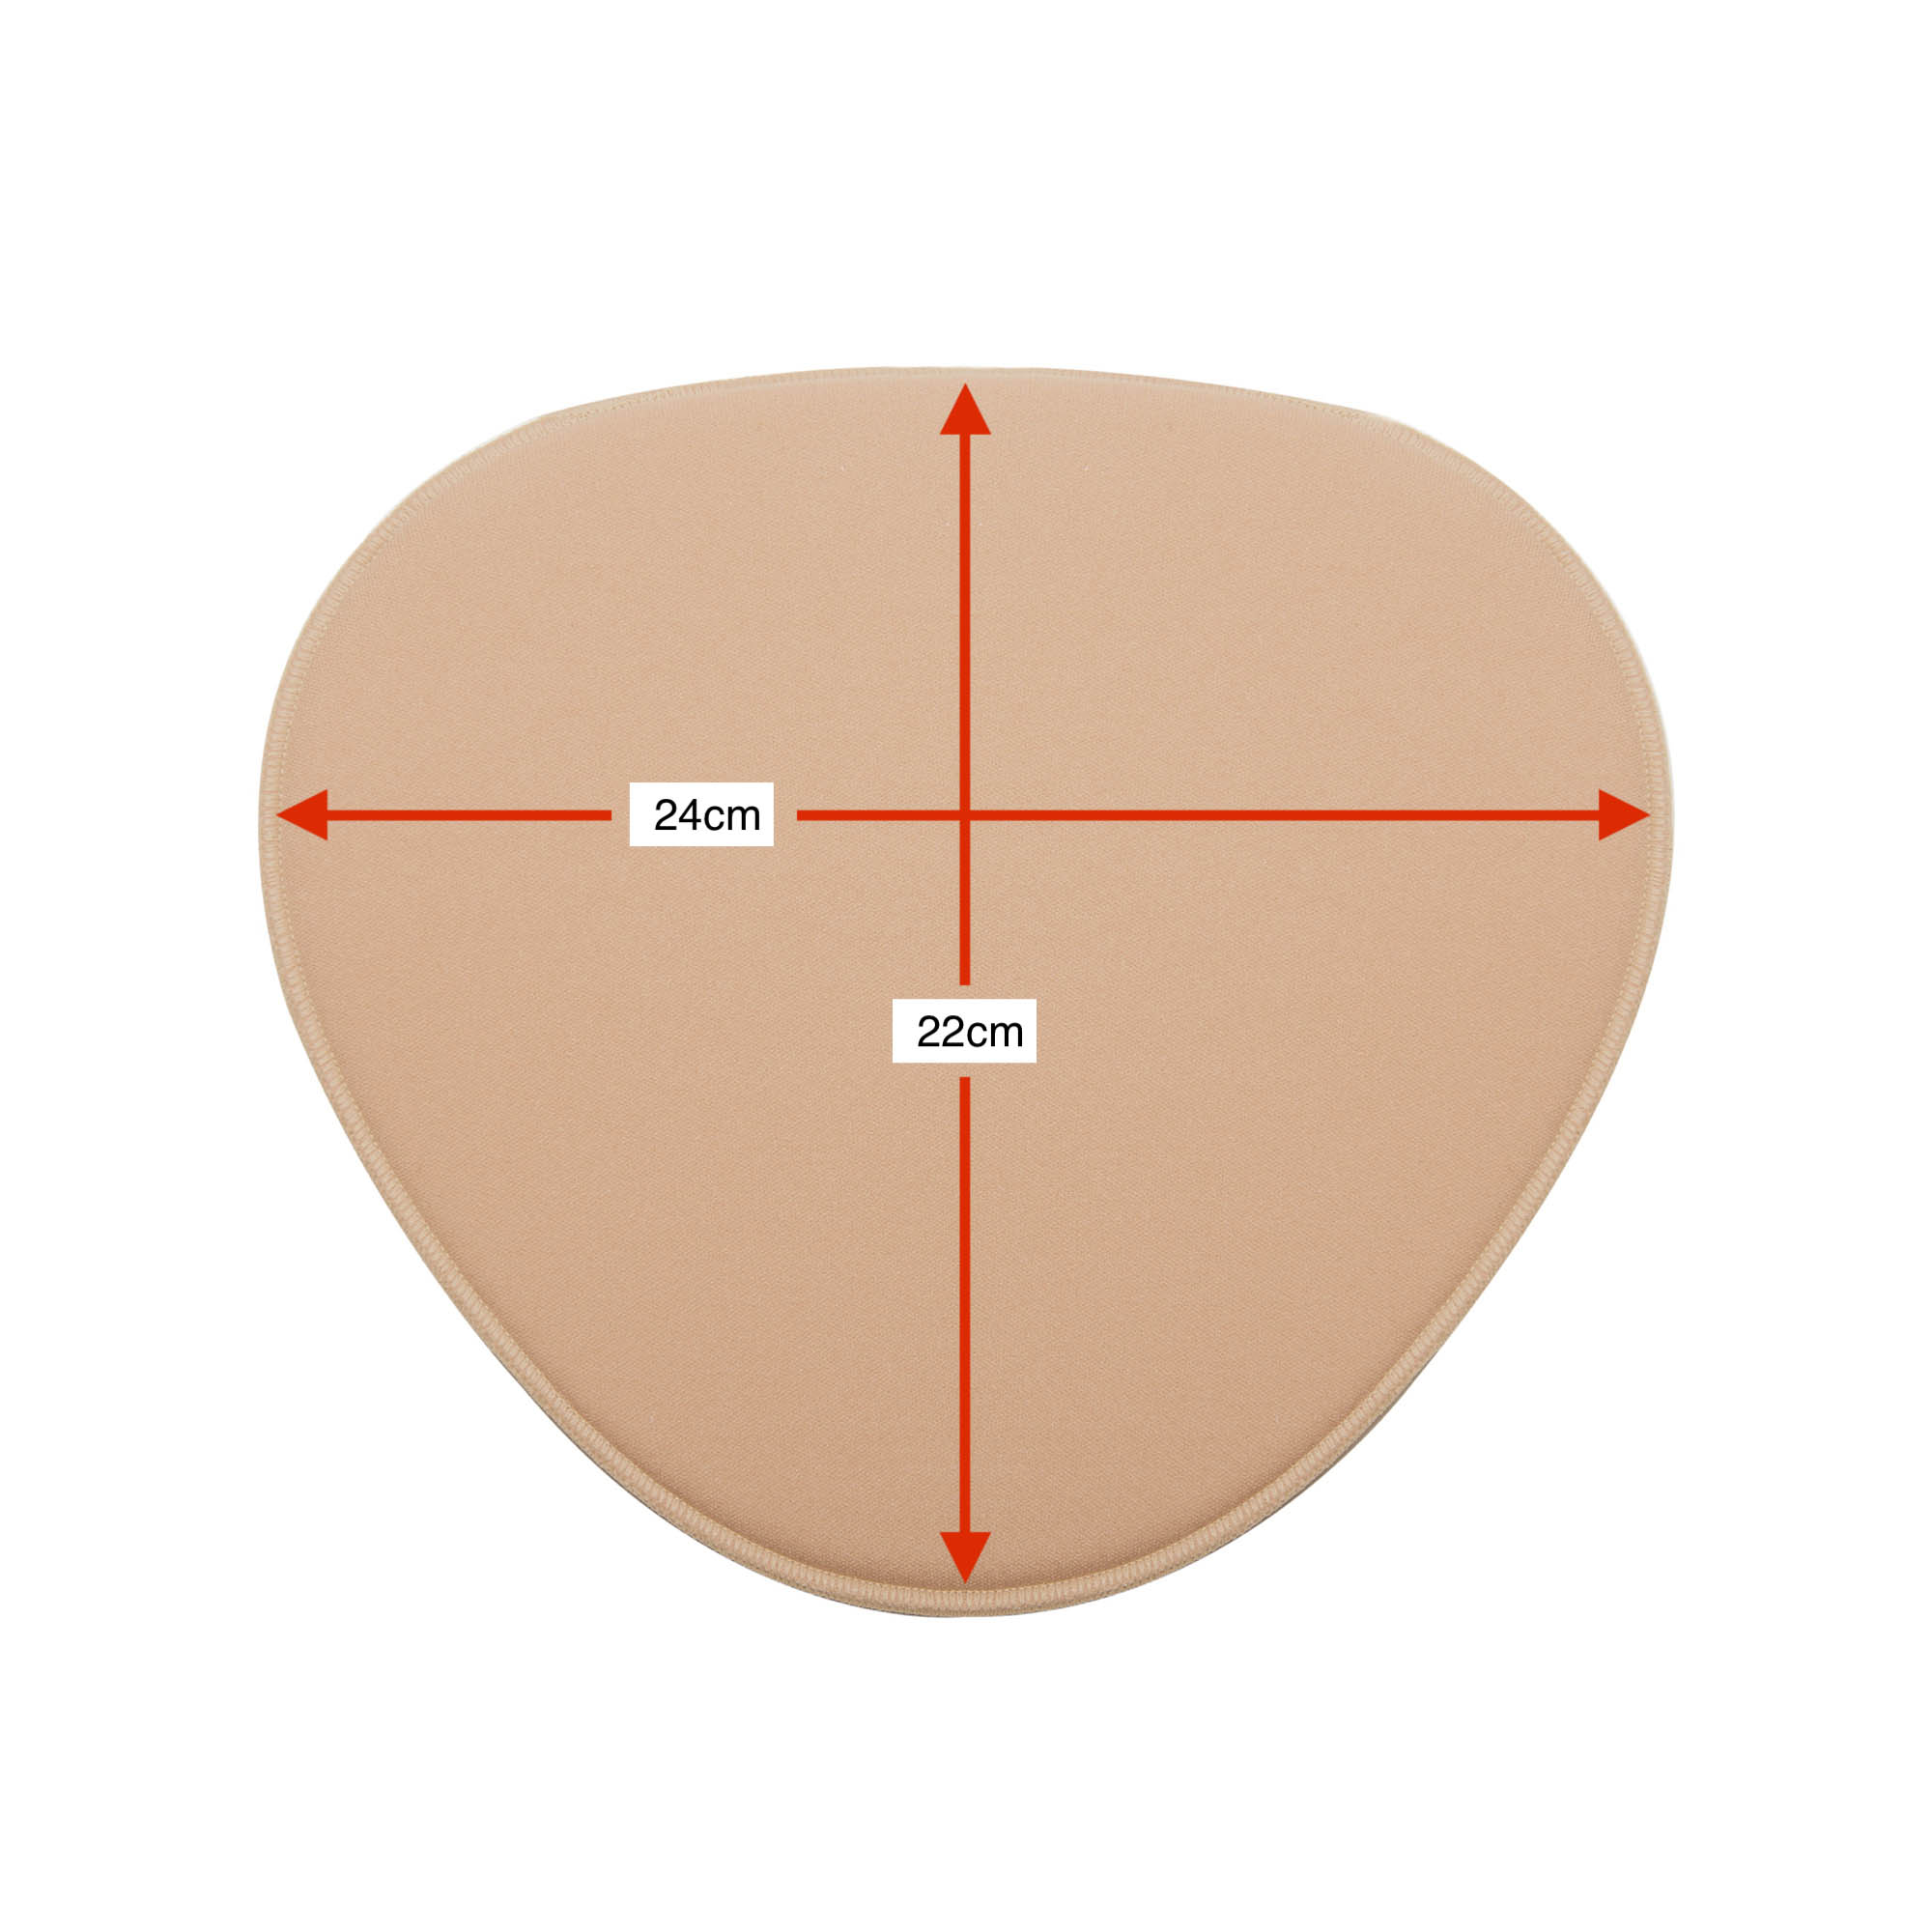 Placa tala rígida pós cirúrgica compressiva para cóccix e costas New Form 90015A formato pera. Ideal p hidrolipoplastia  - Cinta se Nova